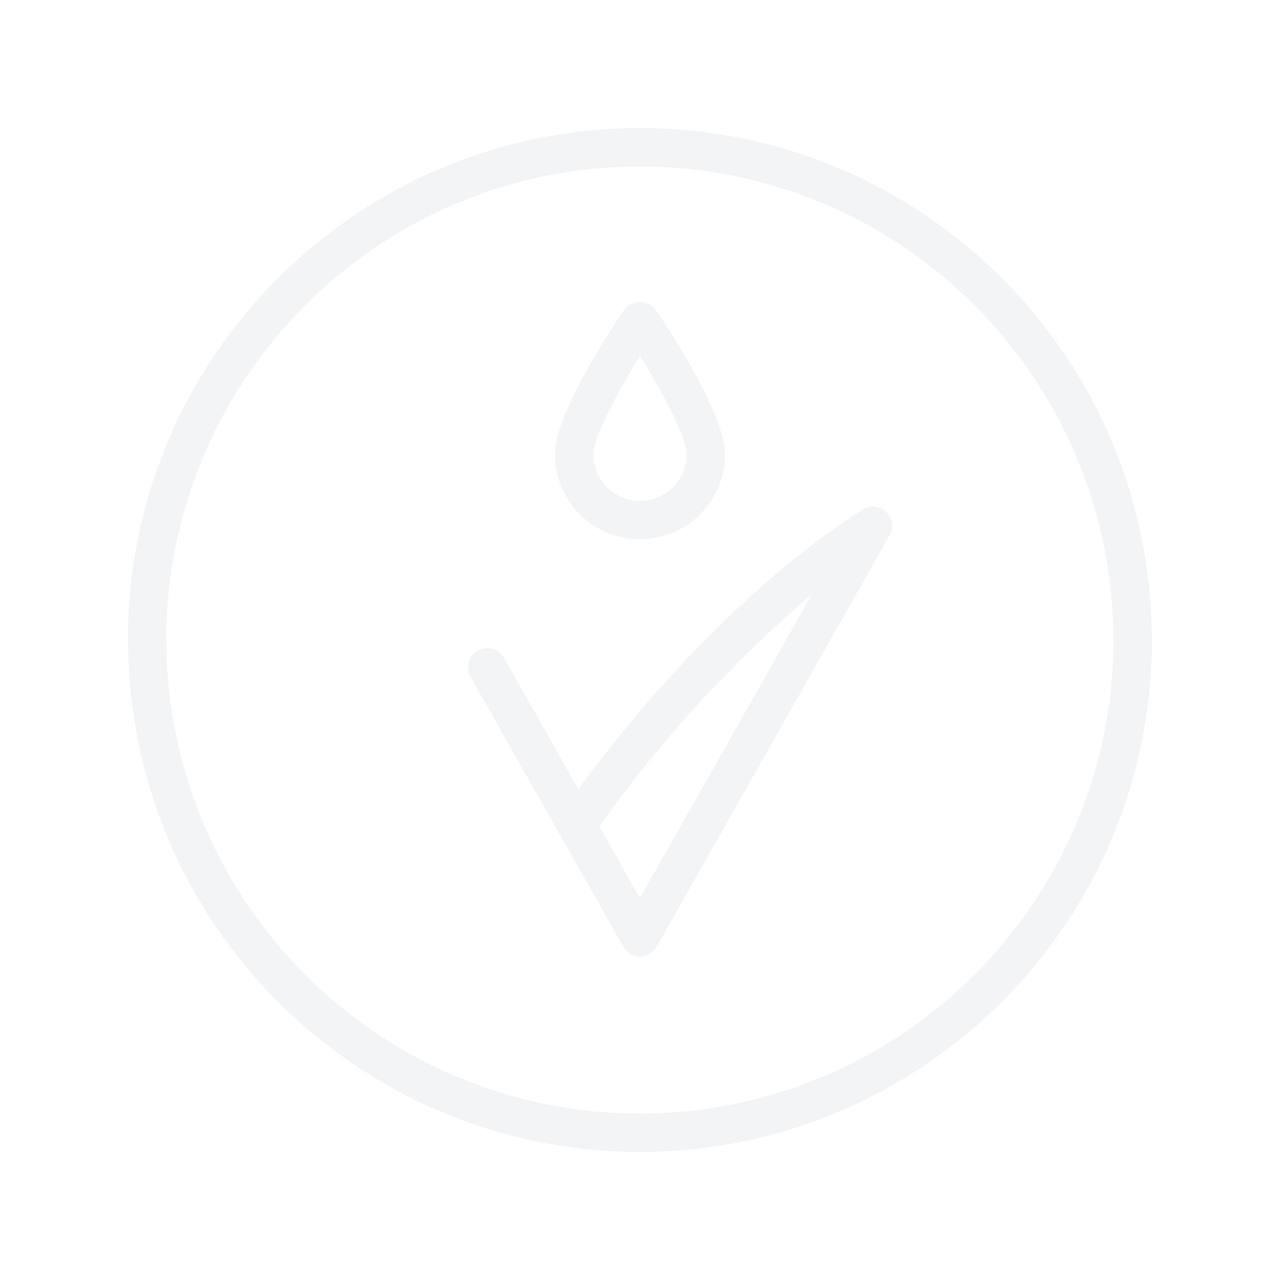 Dior Diorshow Iconic Curler Waterproof Mascara No.090 Black 8ml